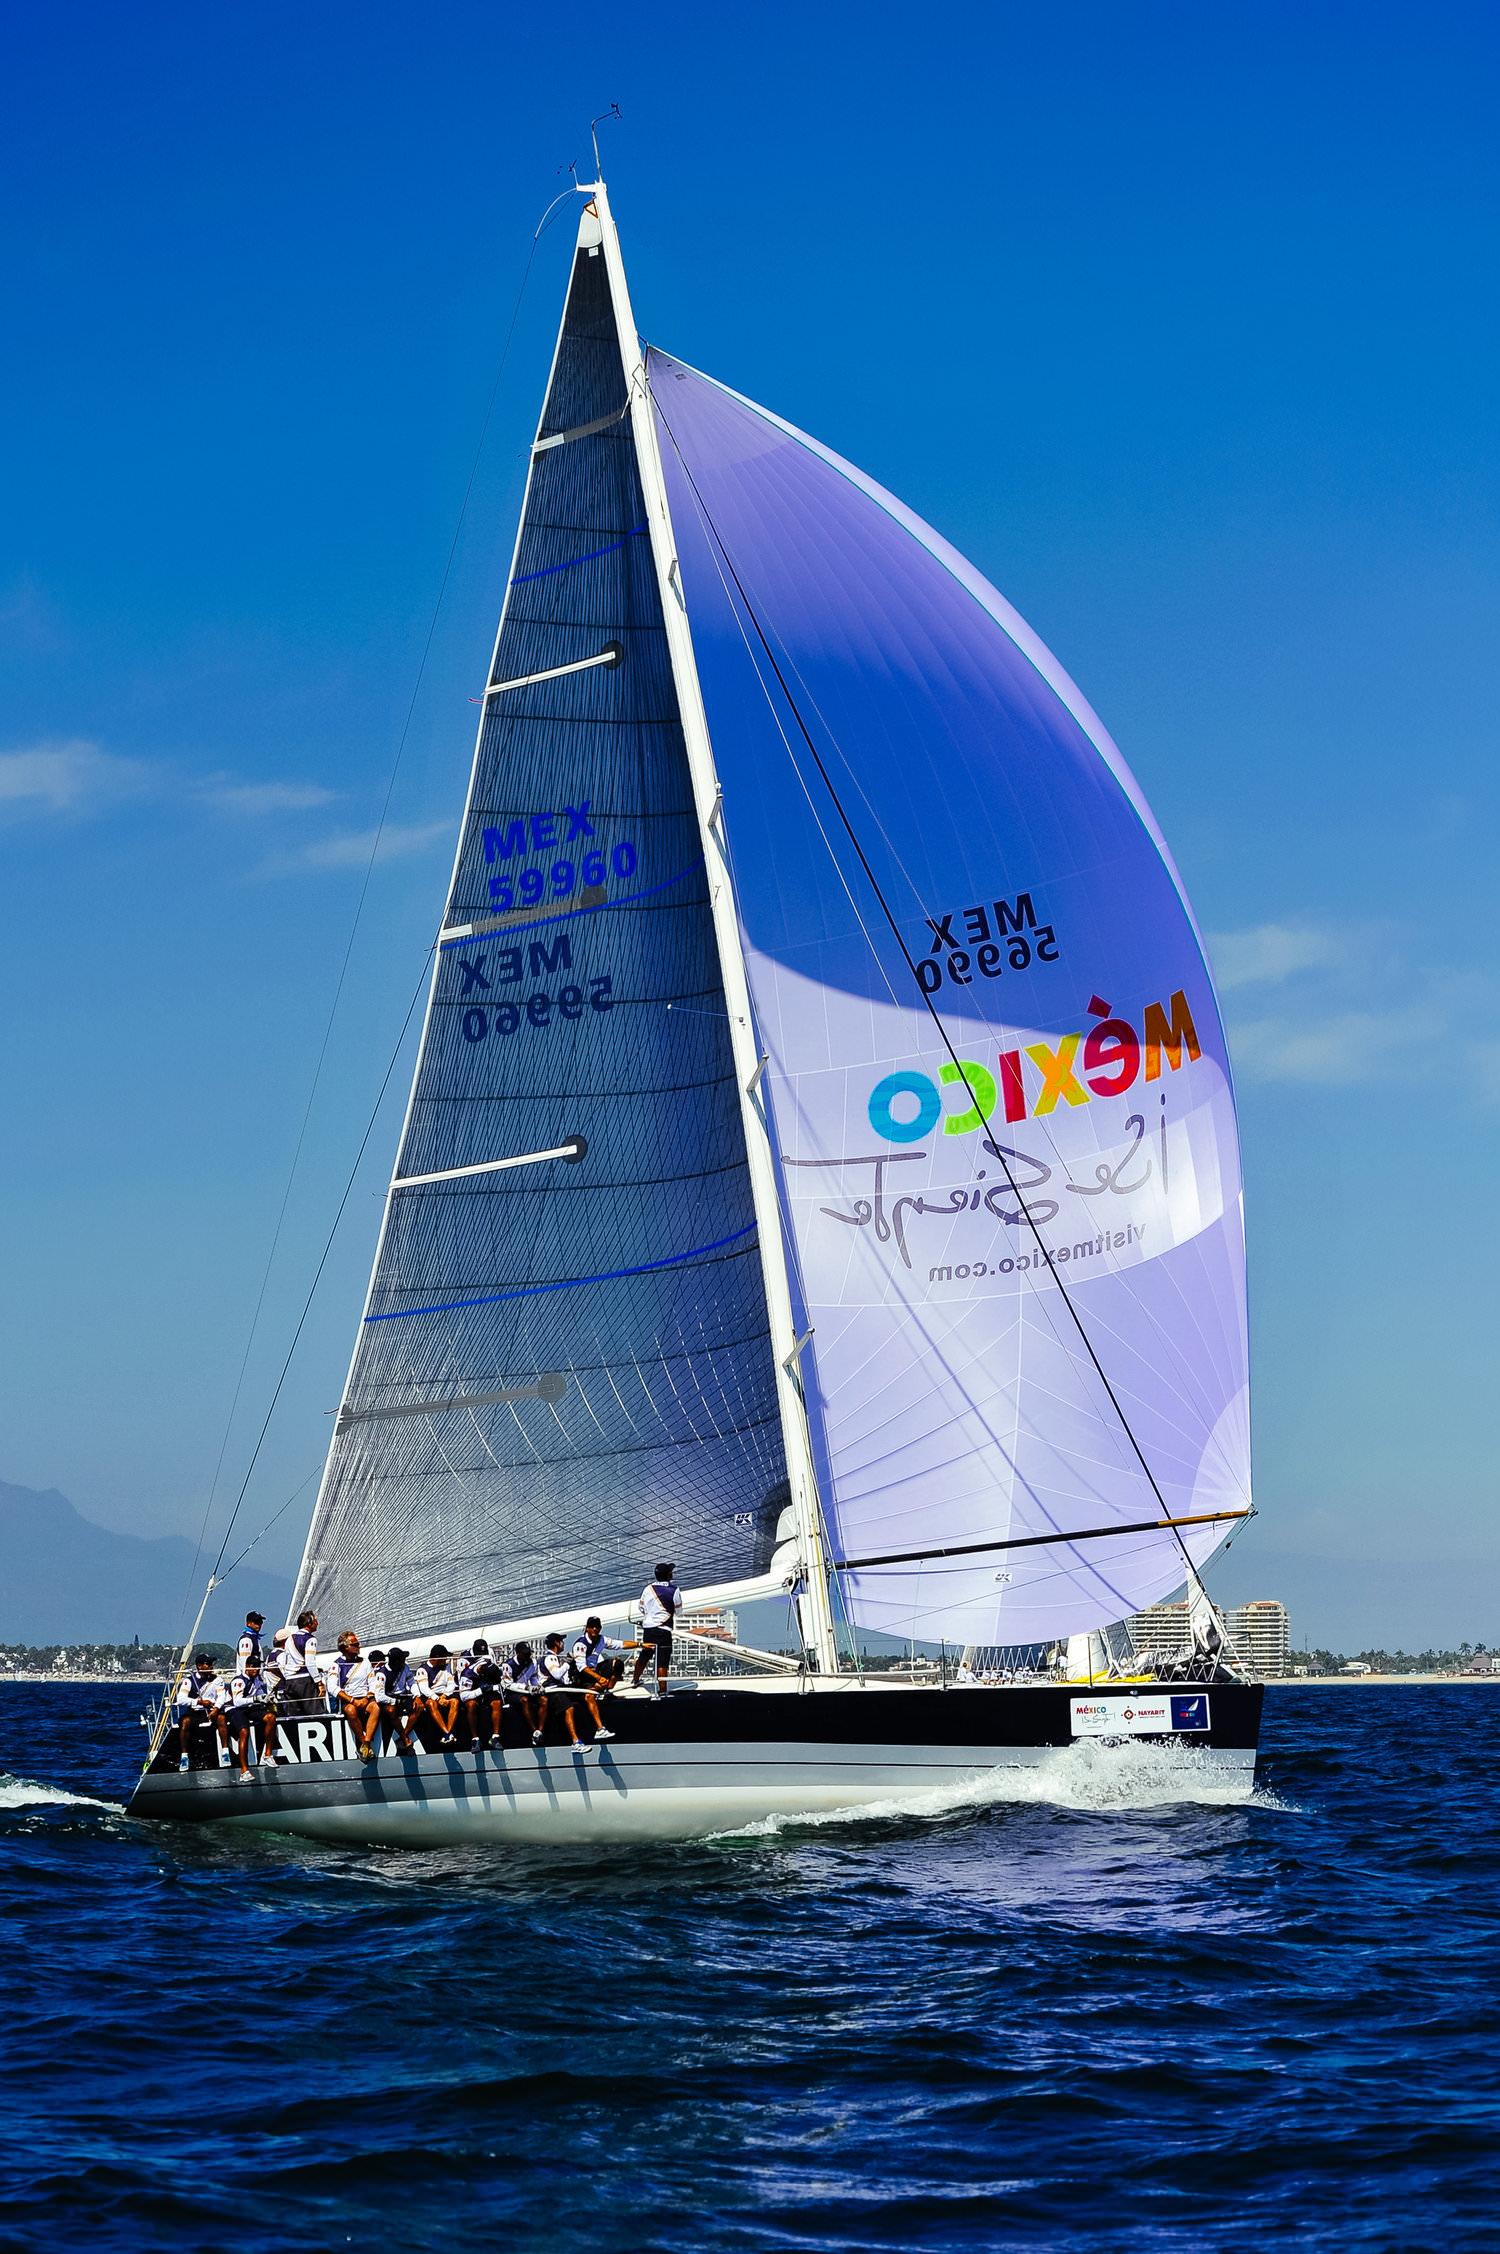 UK+Sailmakers+NM46+Marina.jpeg